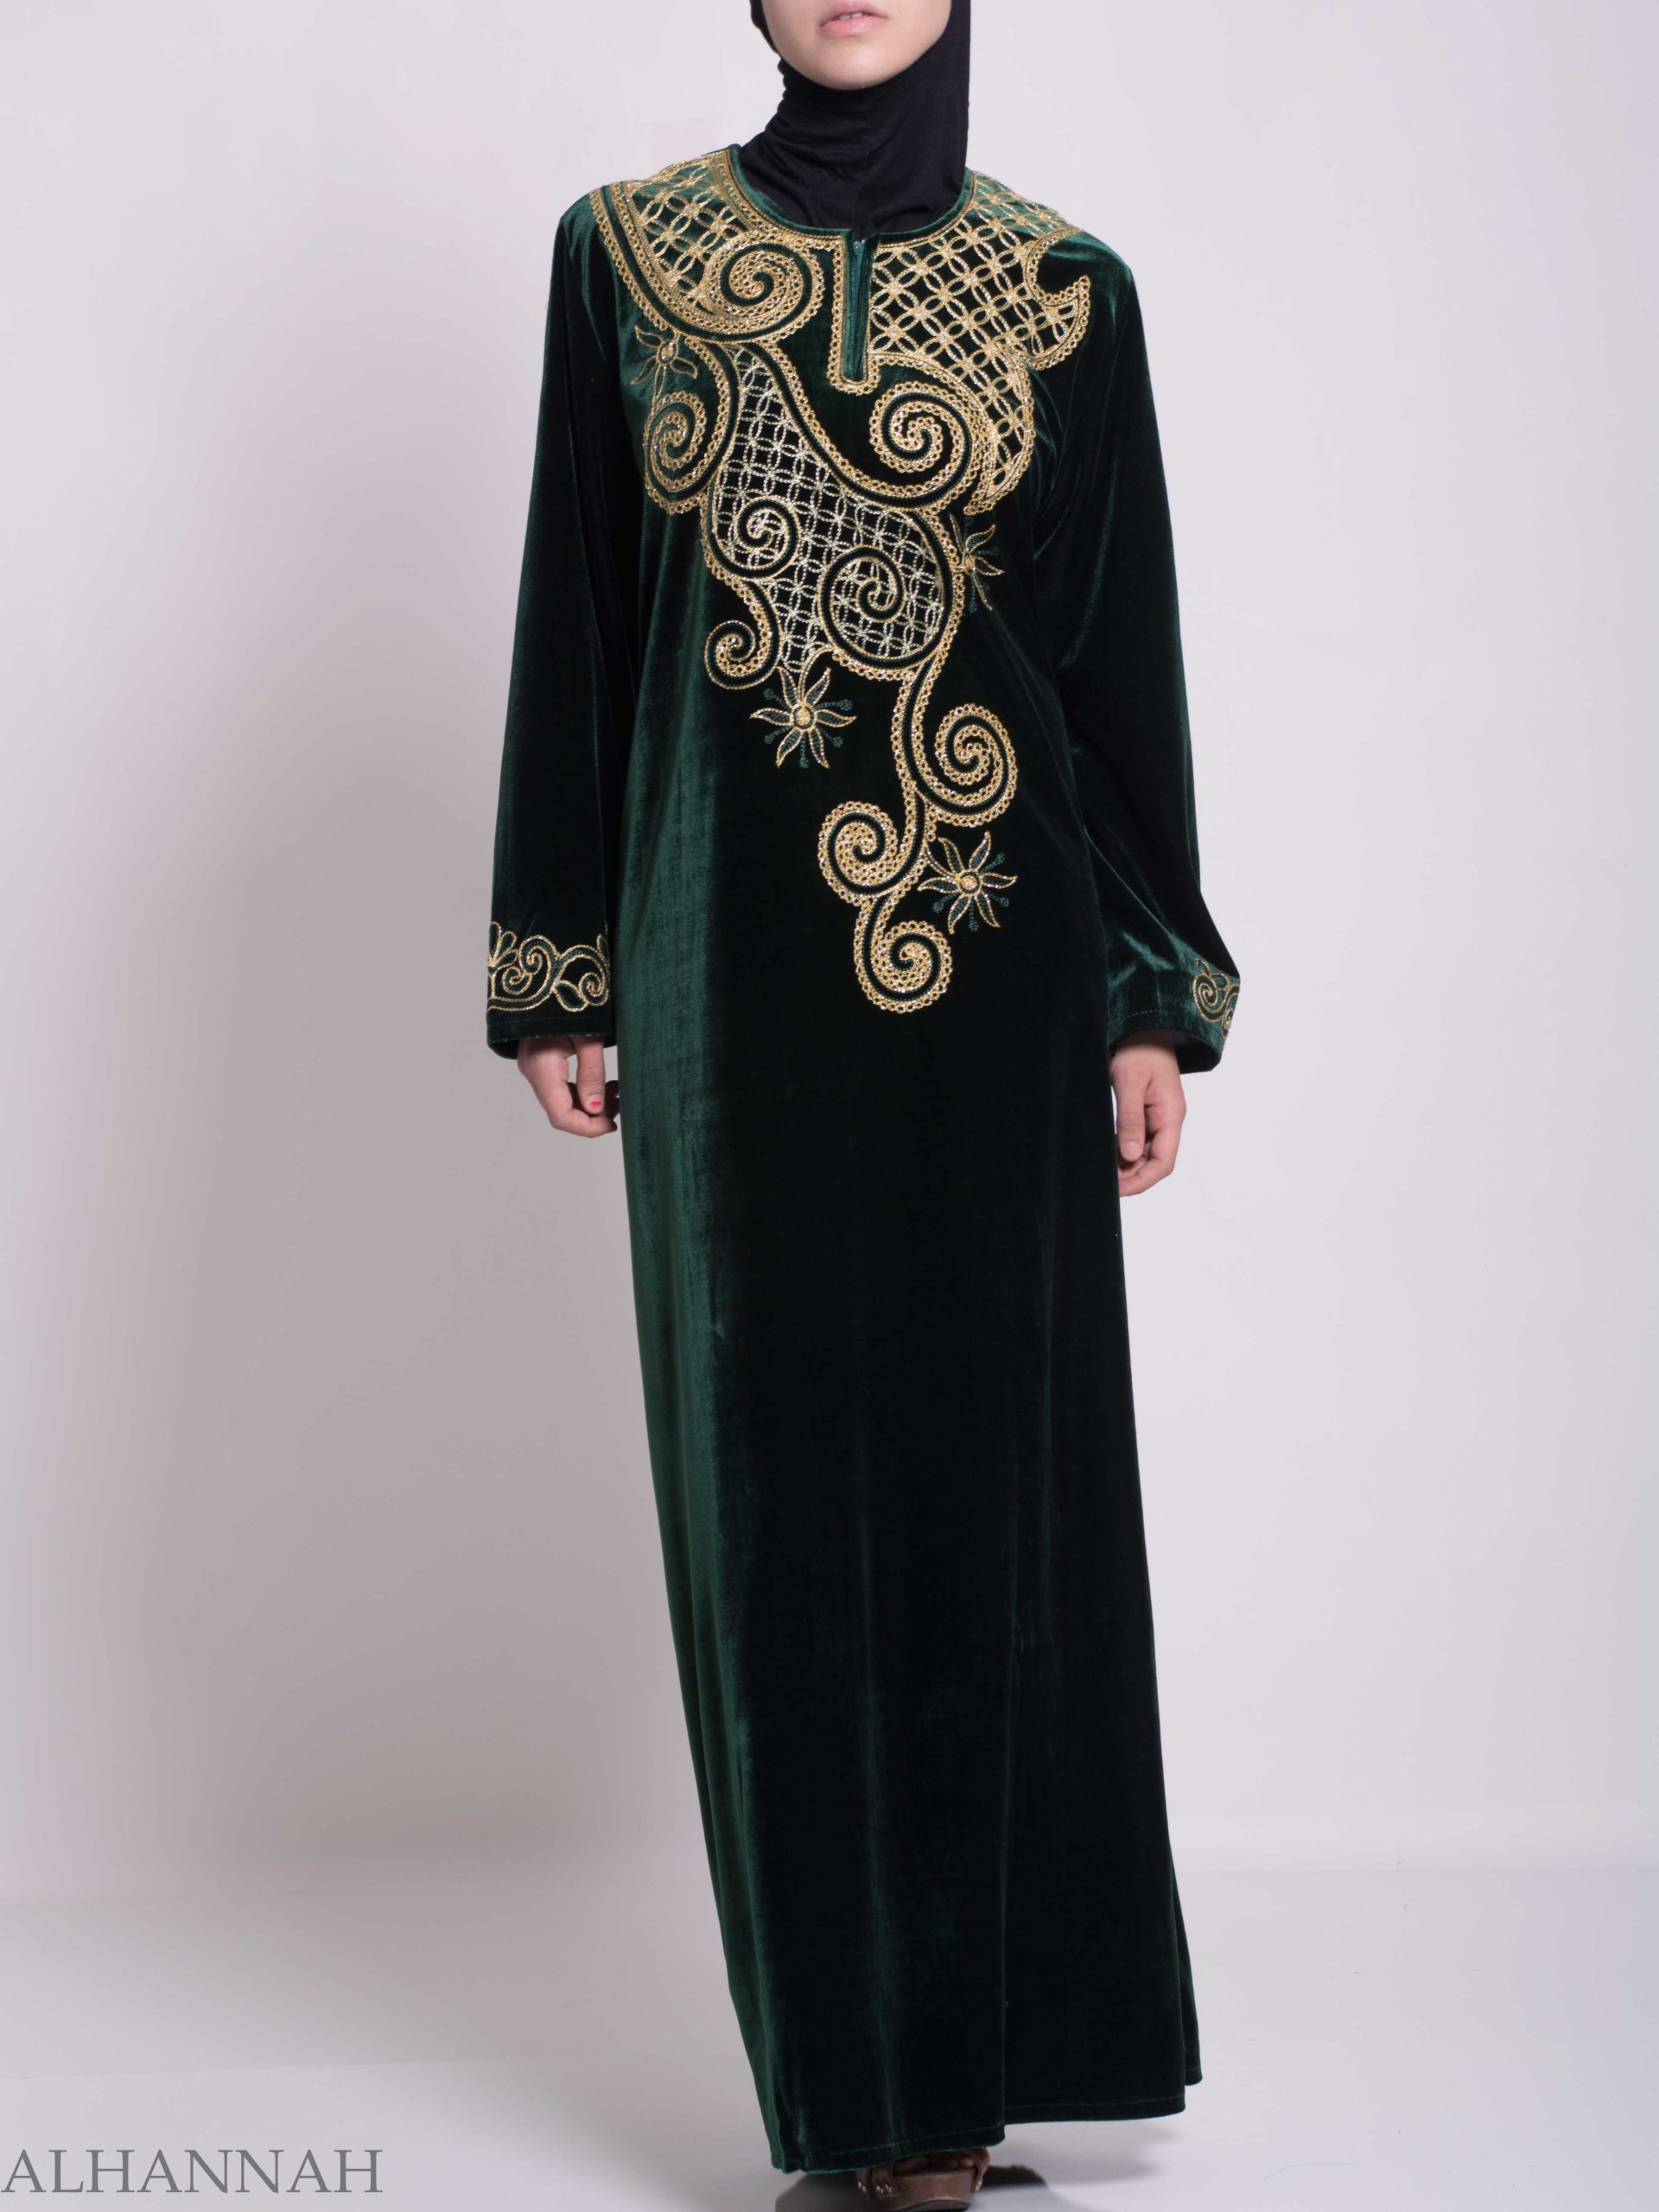 Swirled Day Lillie's Embroidered Syrian Velvet Thobe TH790 (2)